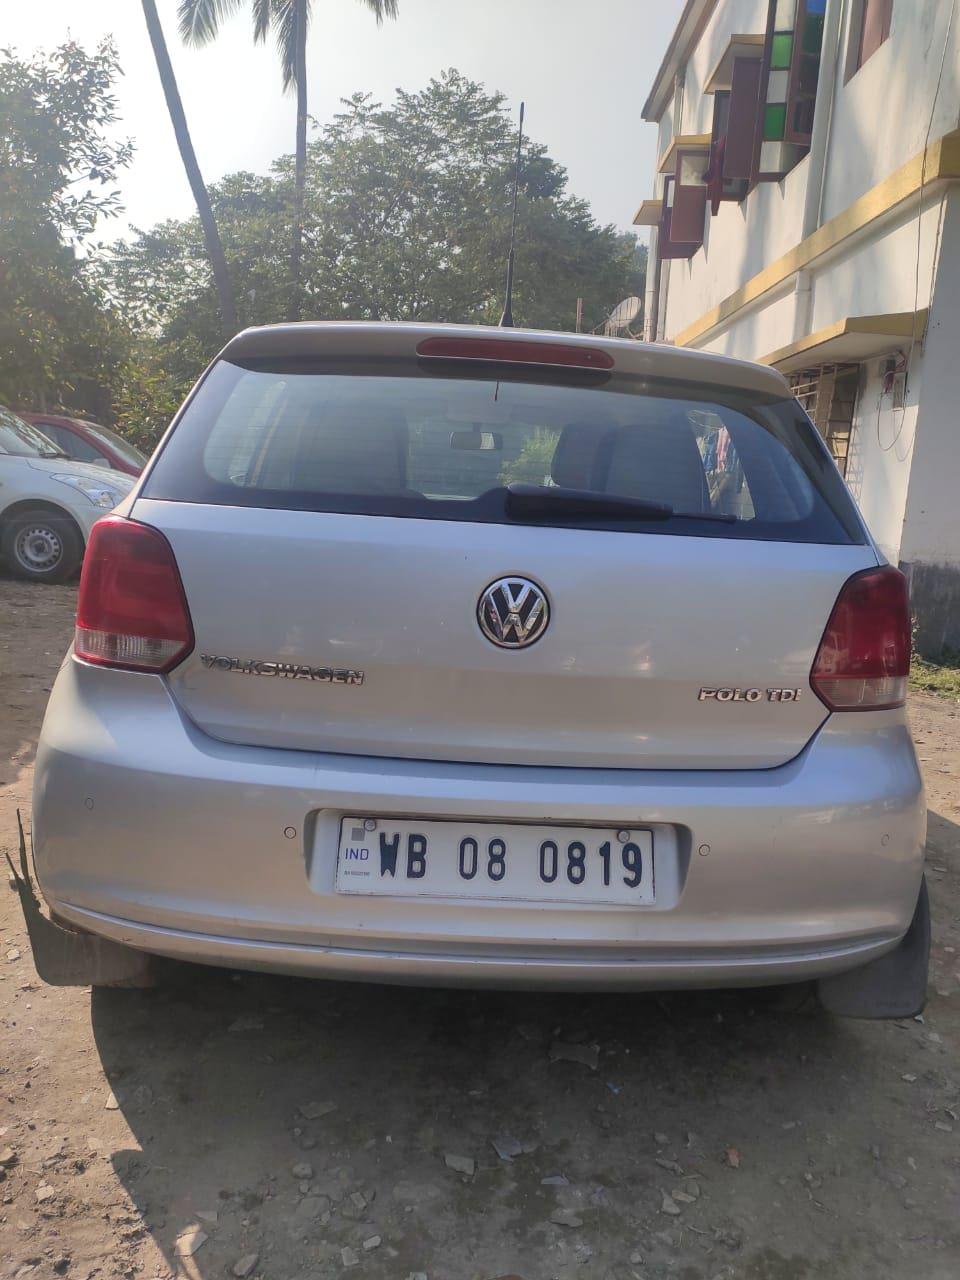 Volkswagen Polo 2009-2013 Diesel Highline 1.2L